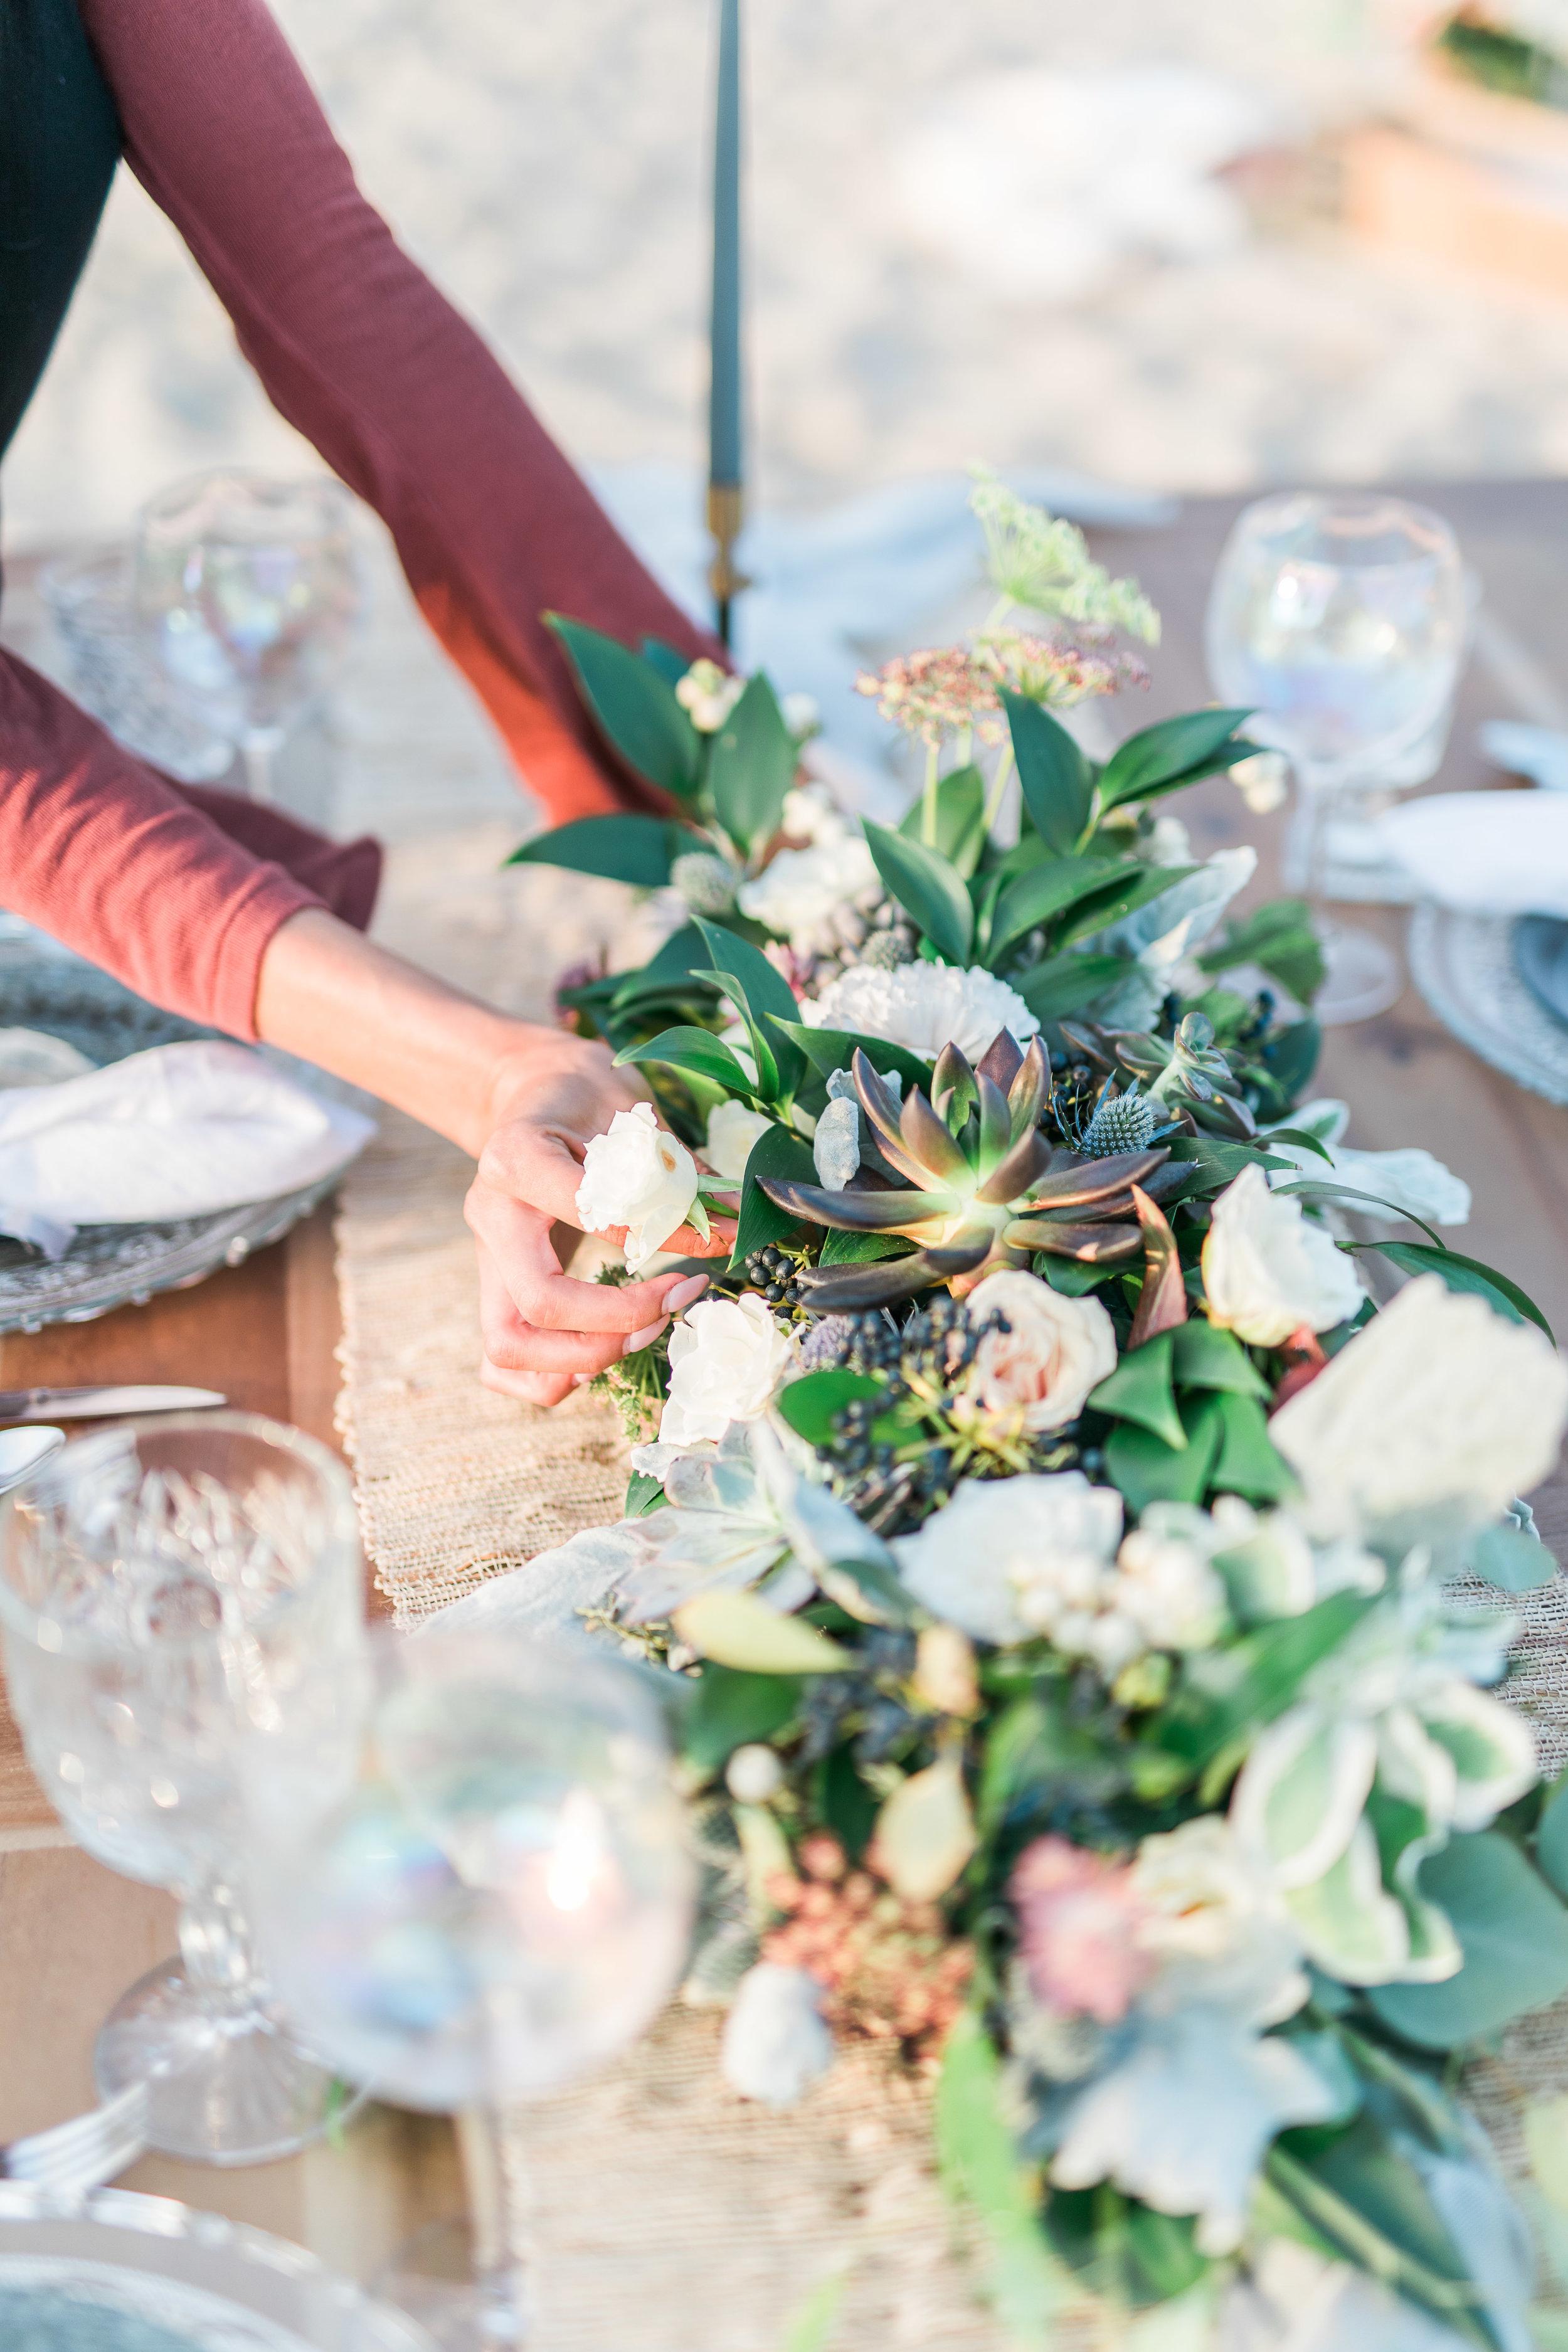 LA-Wedding-Shoot-by-JBJ-Pictures-254.jpg